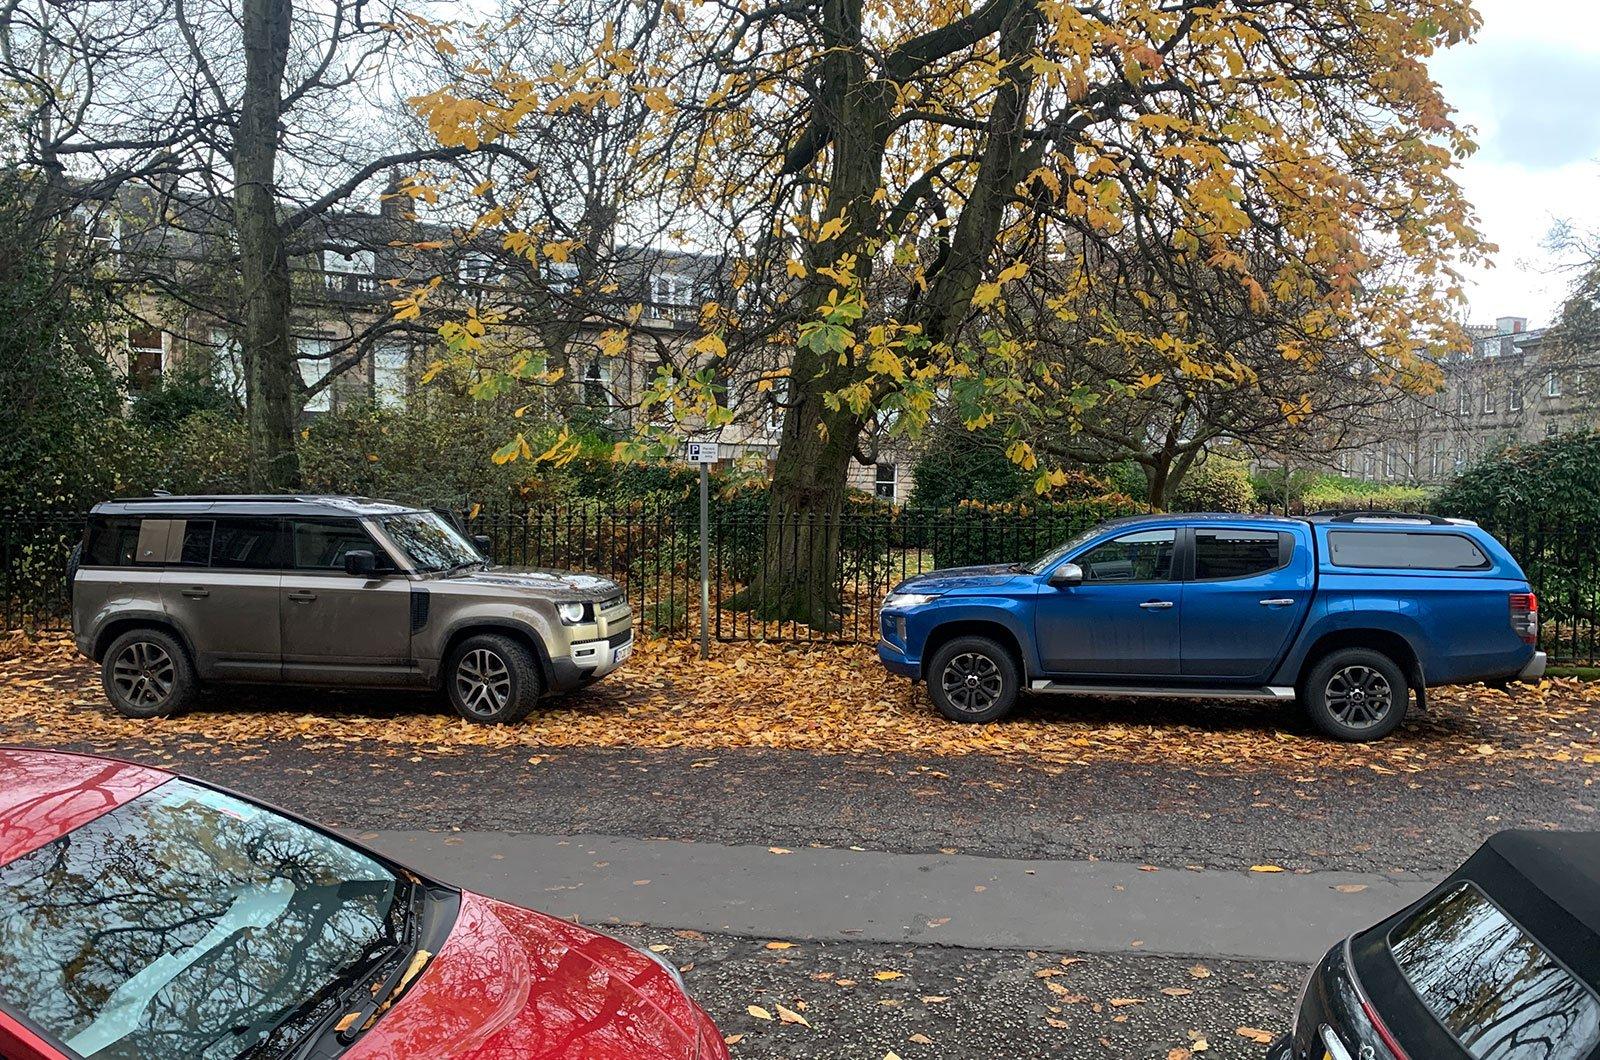 Mitsubishi L200 next to Land Rover Defender